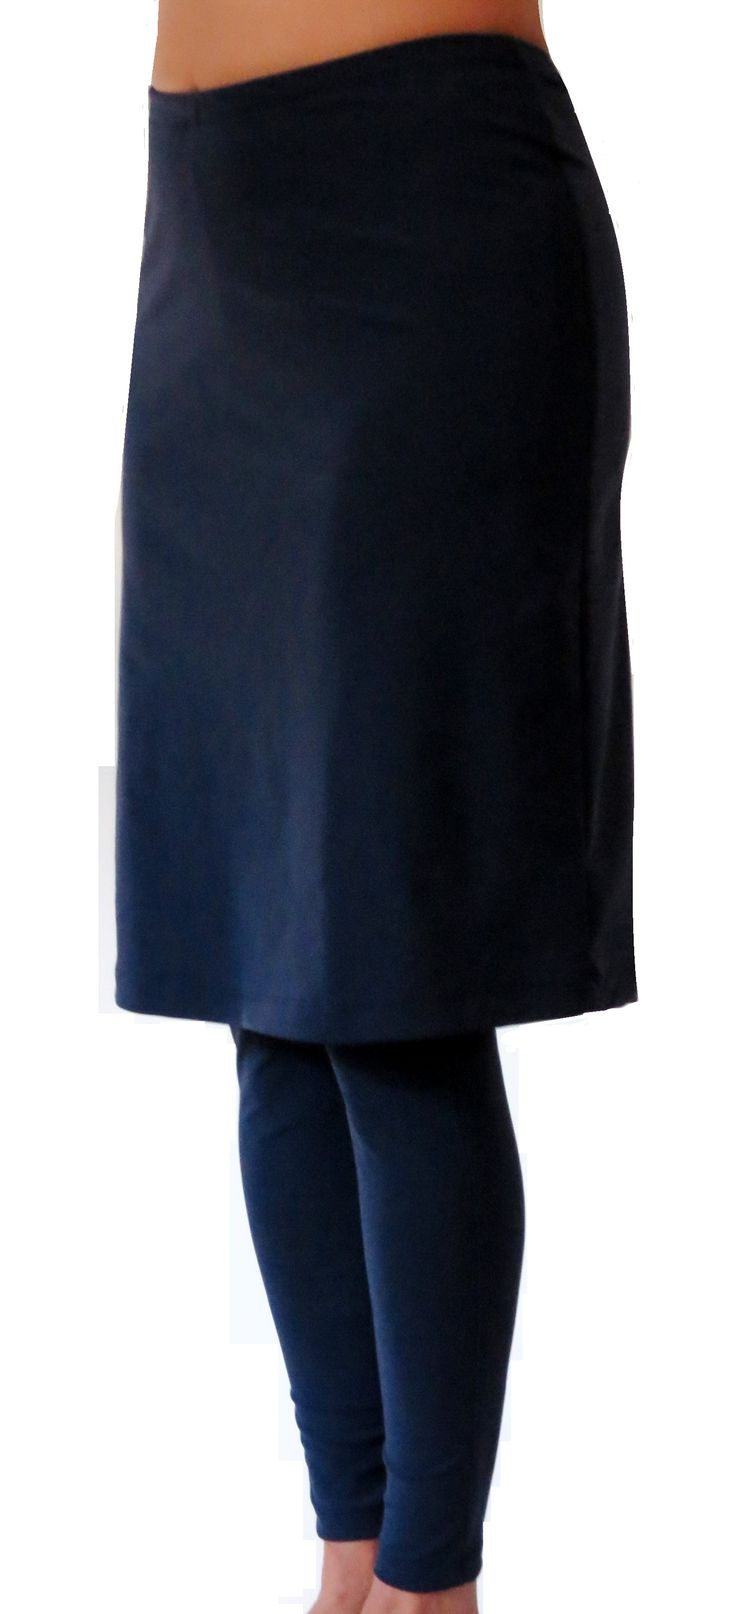 LEAH | Skirt with Leggings